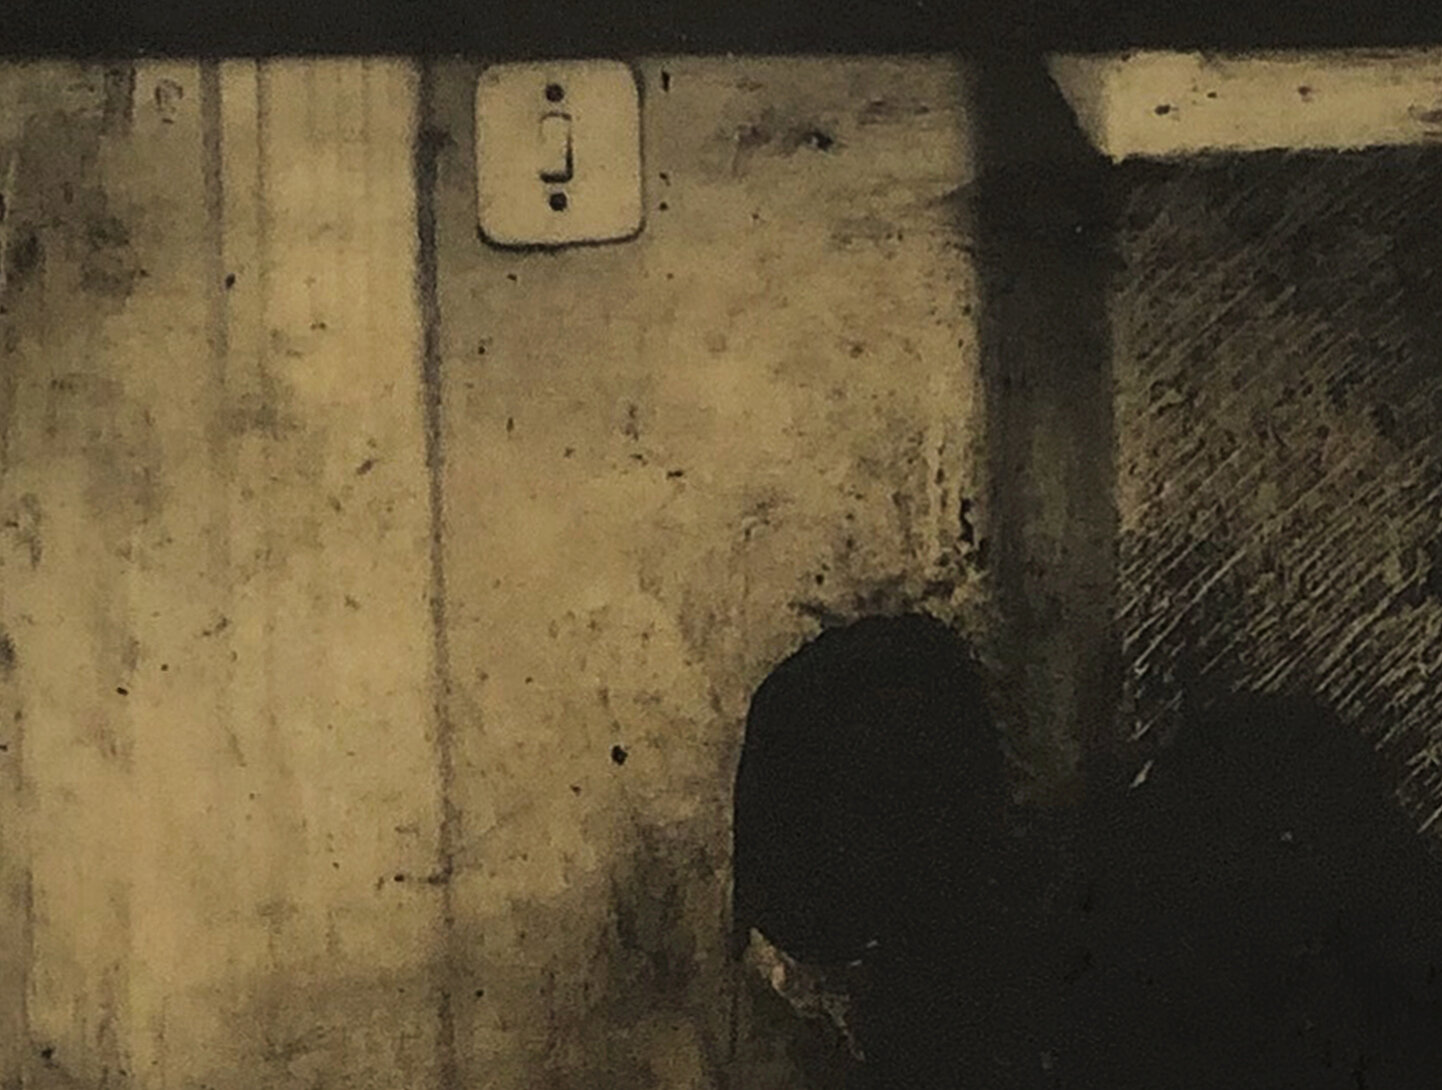 Virgilio Rospigliosi studio per ambiente 1997©detail.jpg